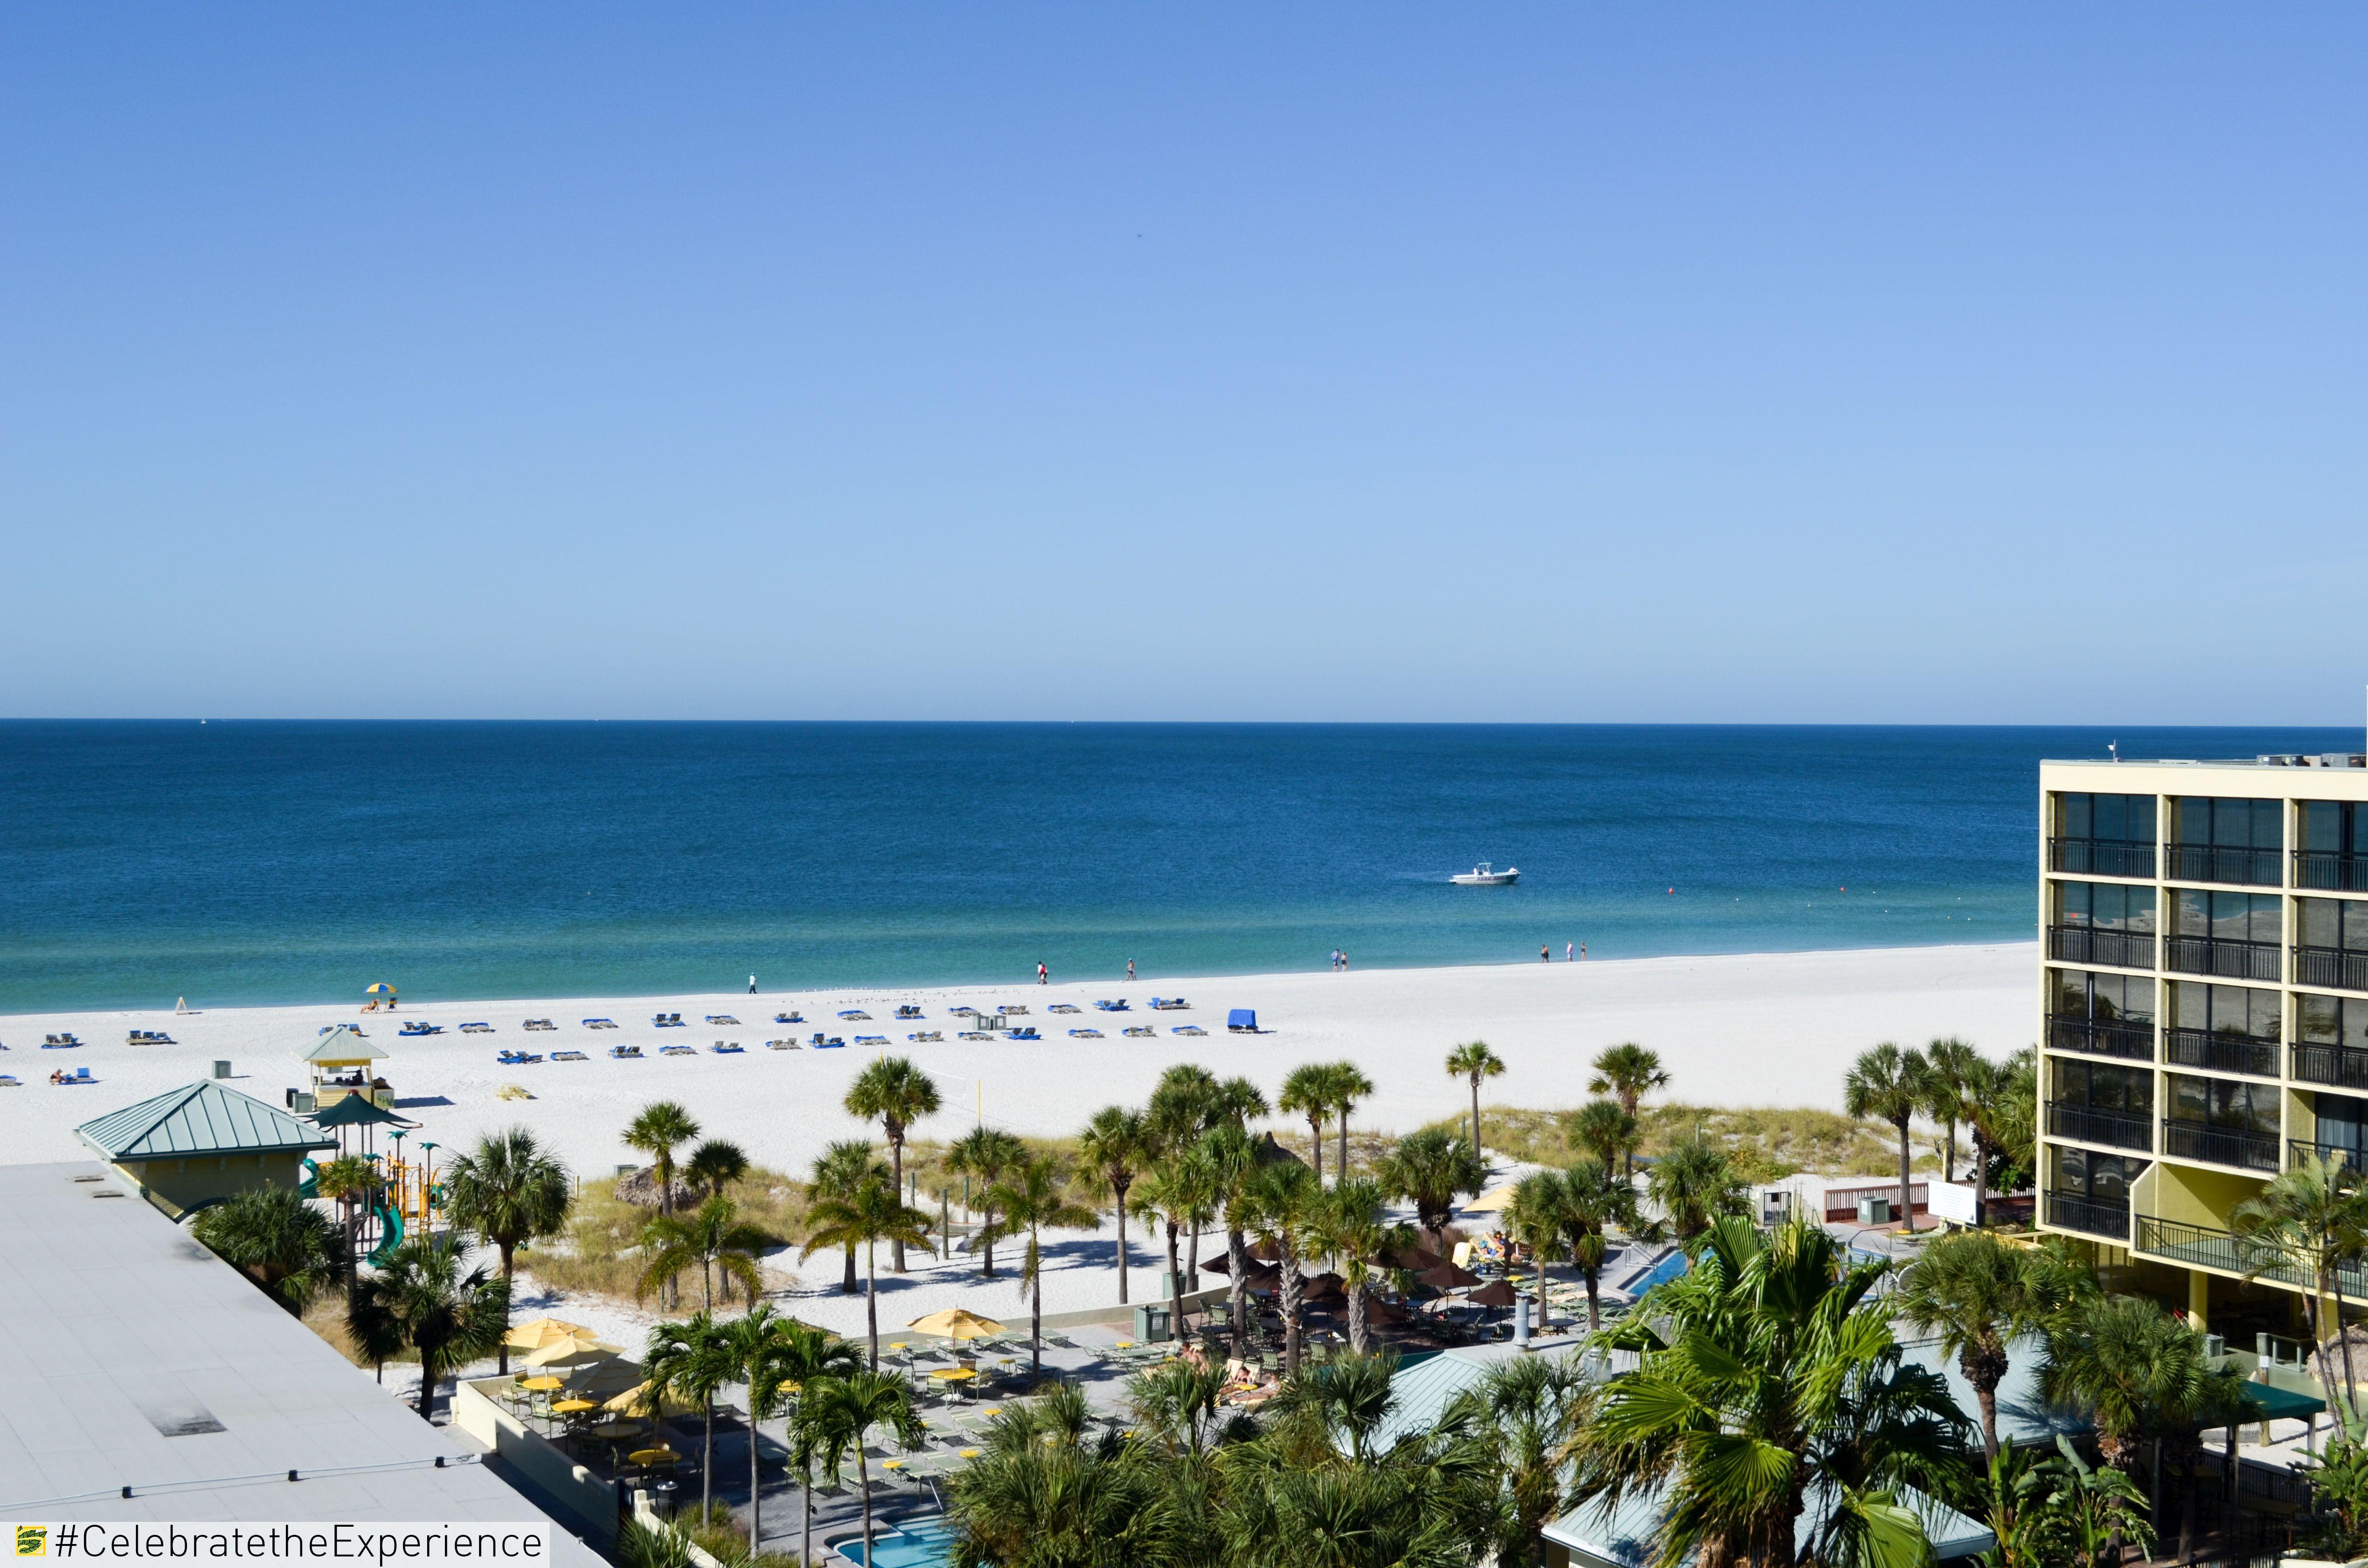 Beach Front Resort Stpete Florida Beach Blue Family Fun Resort Vacation Clearwater Tampa Sirata Beachfront Hotels Beach Beachfront